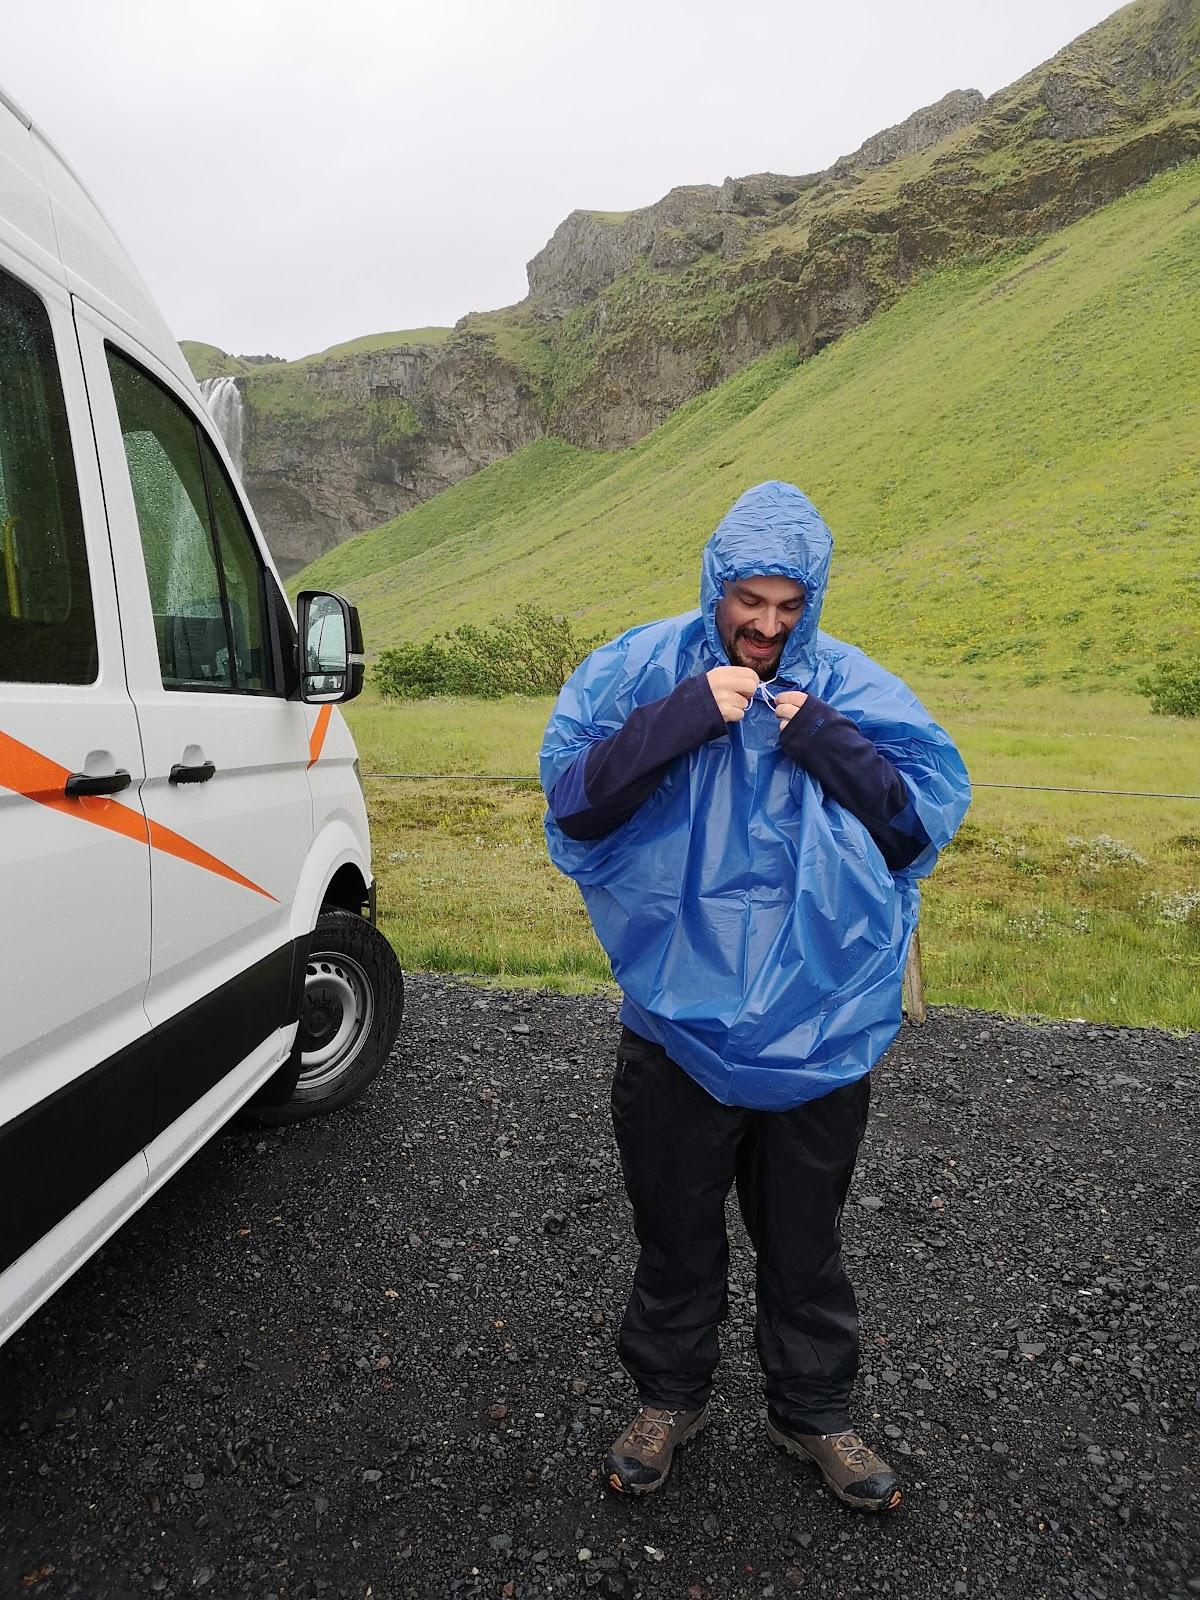 Traveler in rain gear.